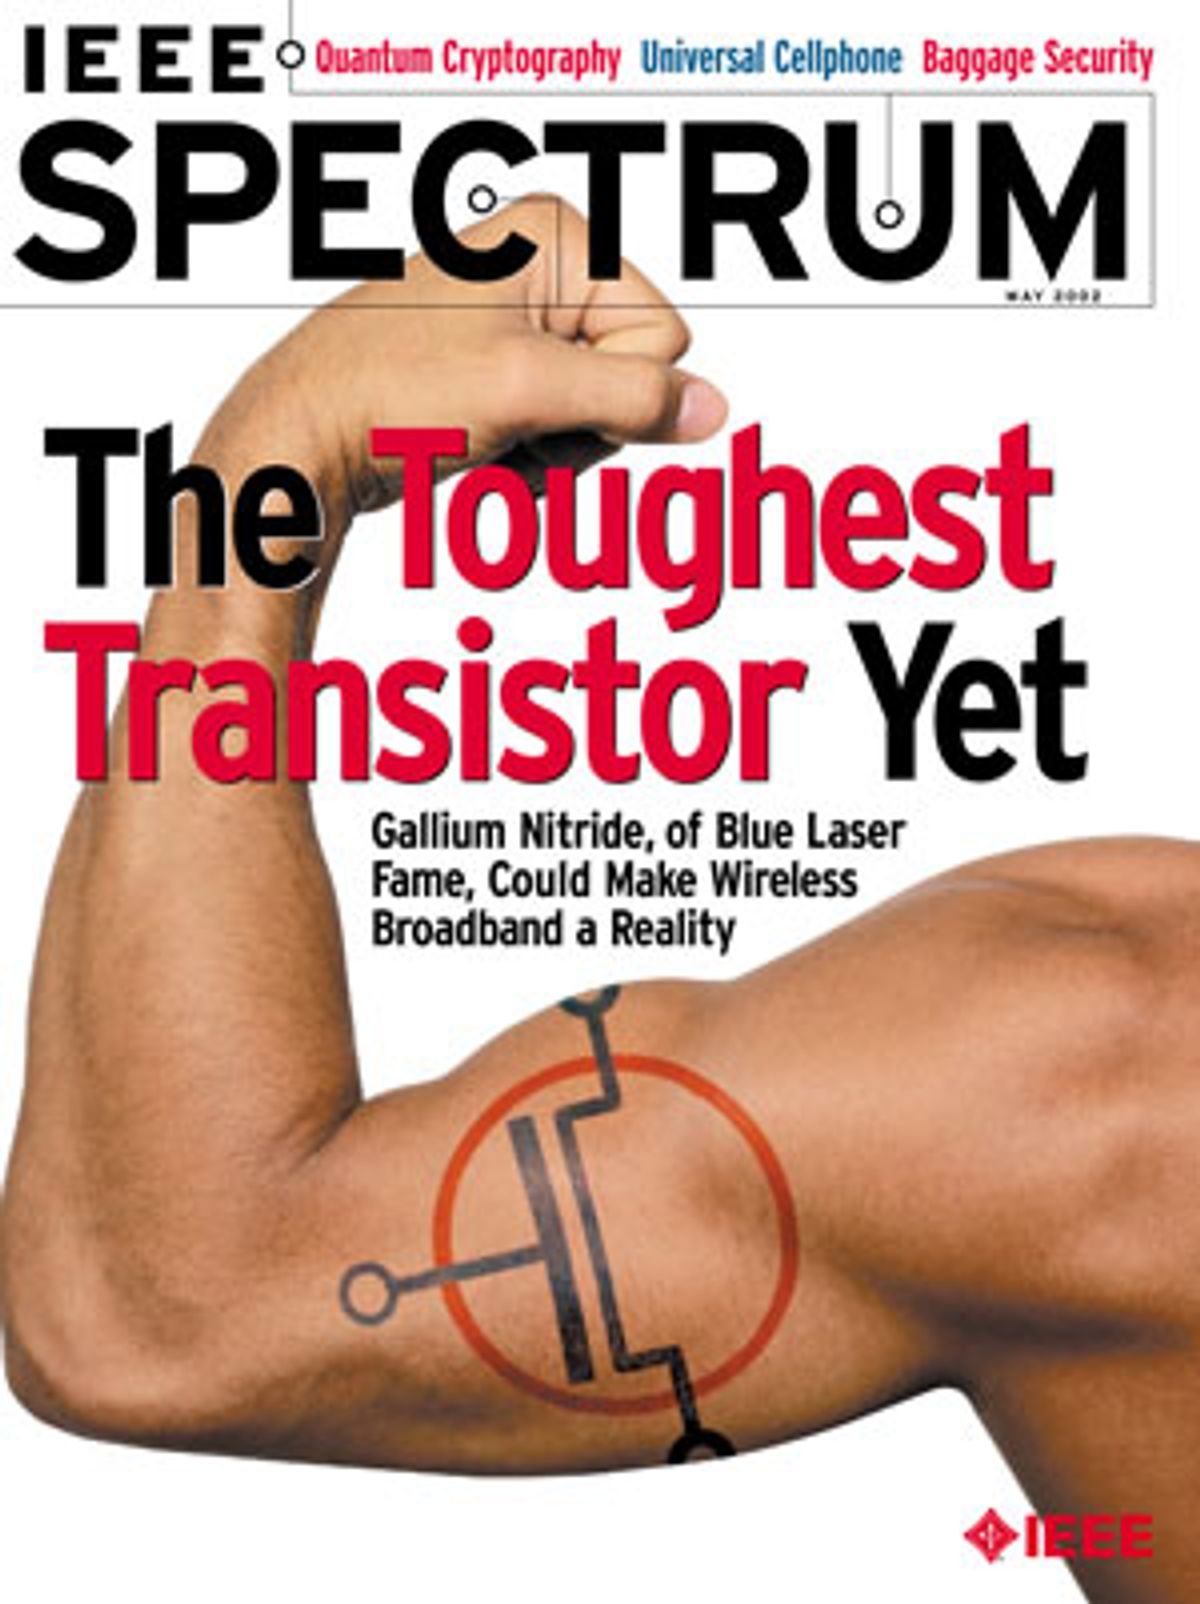 Image of IEEE Spectrum Magazine Cover.